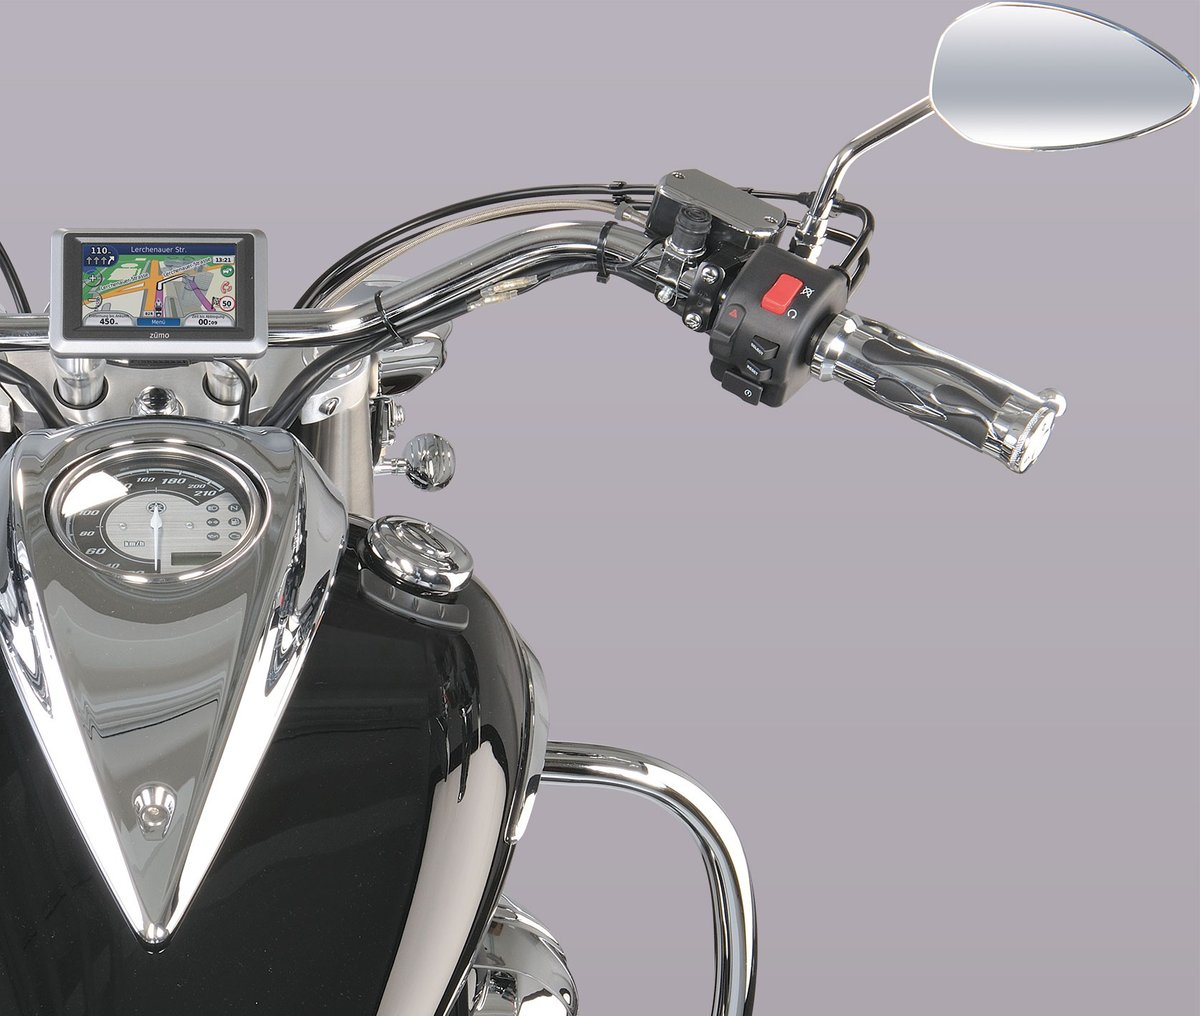 Yamaha XVS 950 Midnight Star